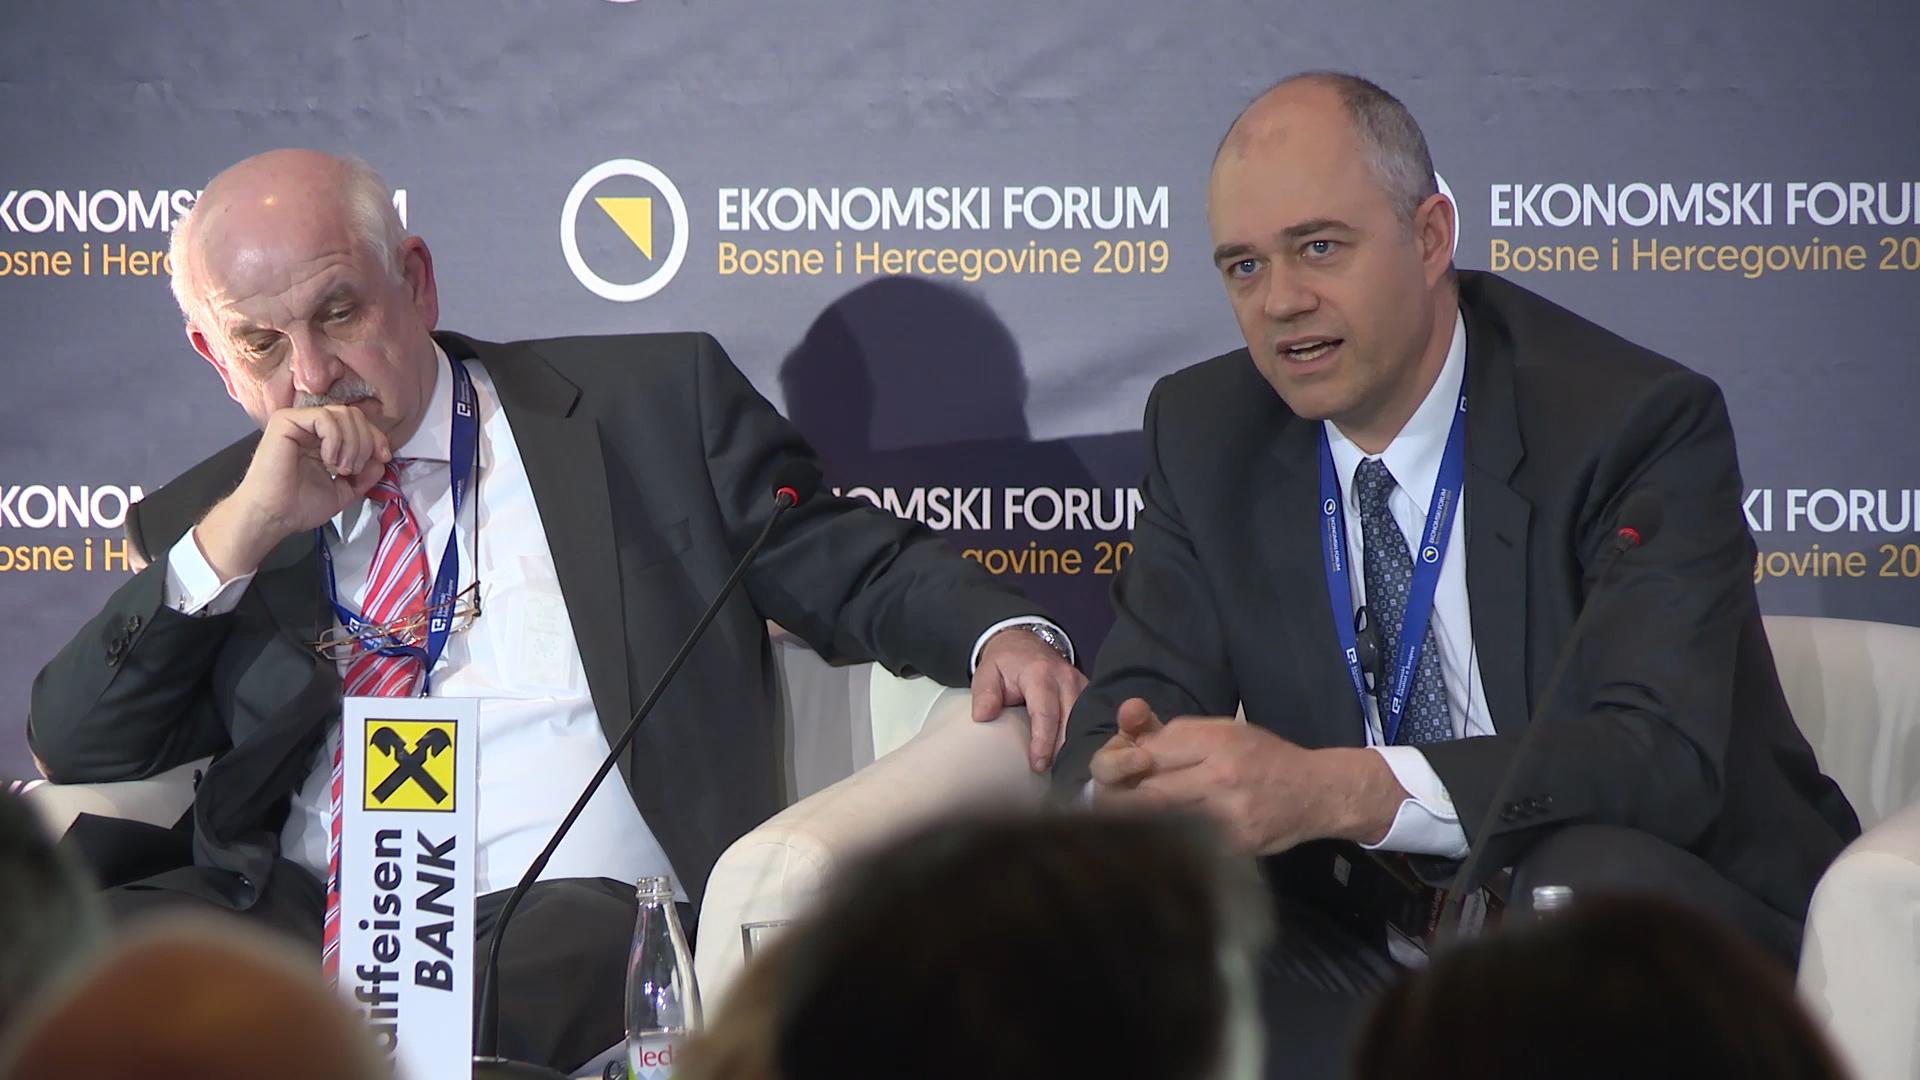 Evaluating the impact of Bosnia and Herzegovina's economic forum